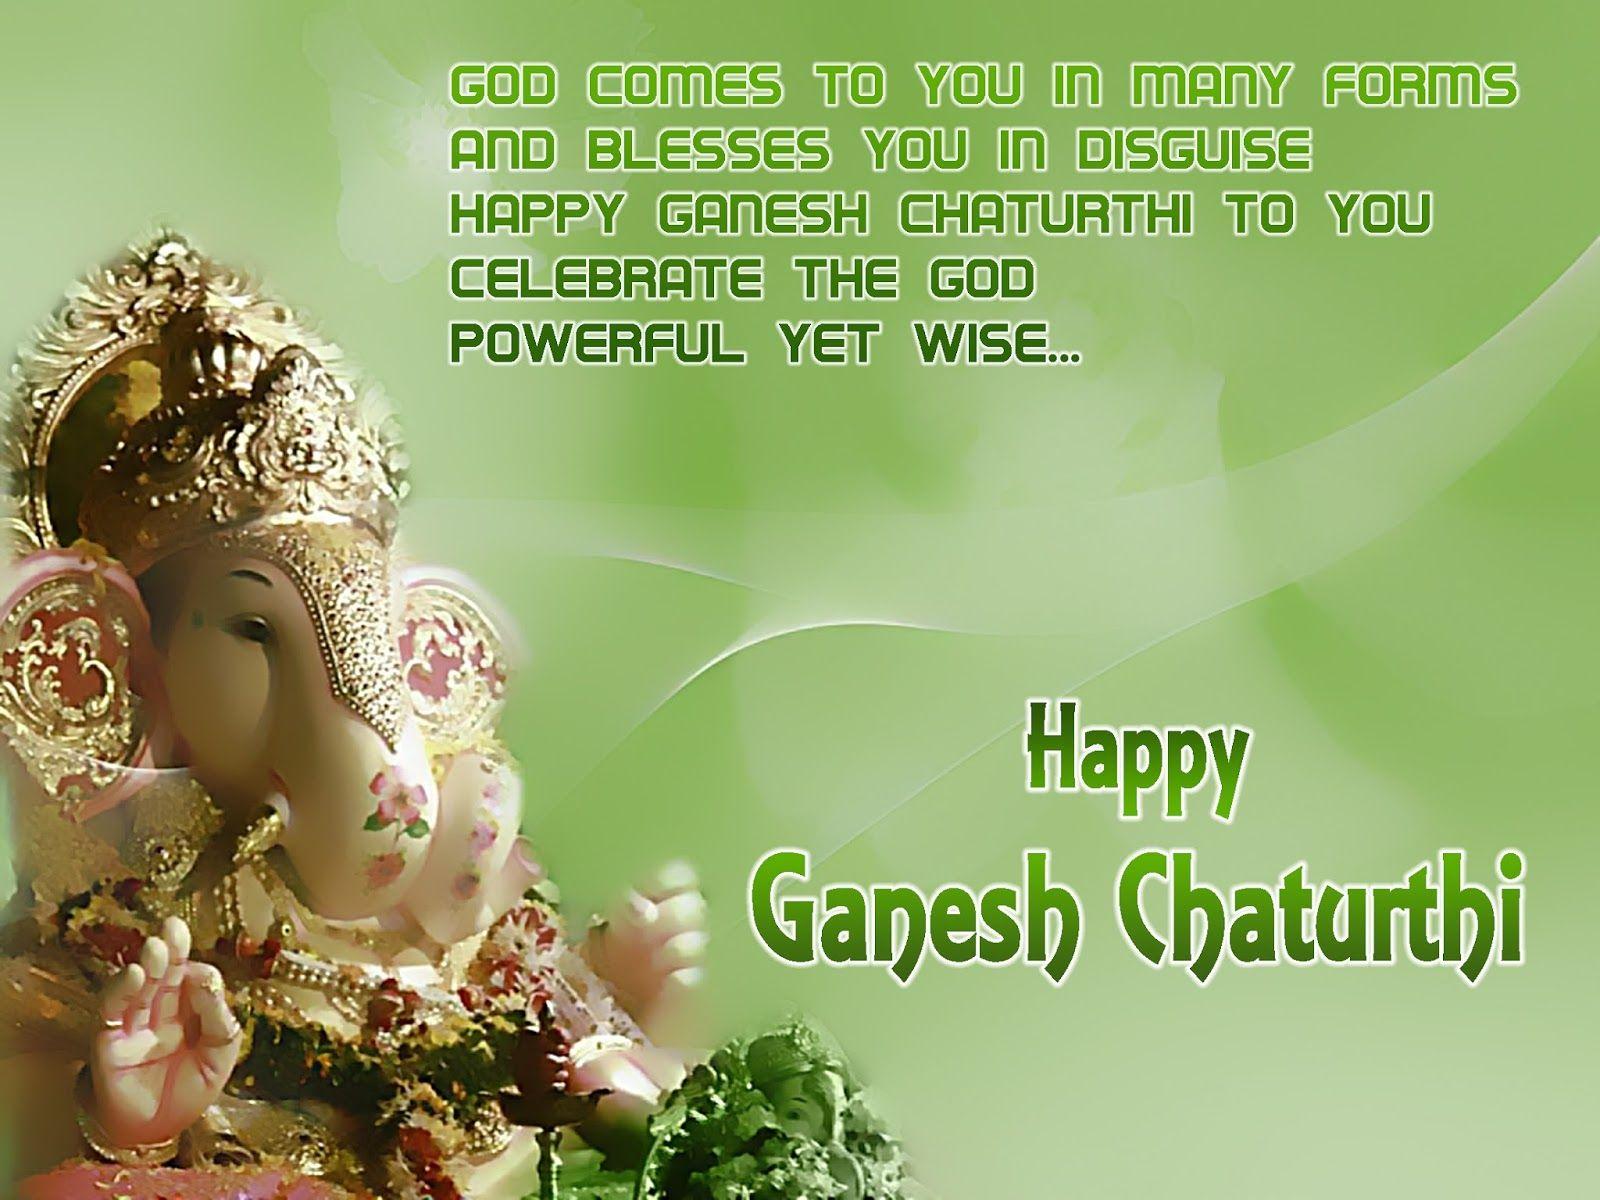 Ganesha Chaturthi Greetings Cards Desktop Walls God Ganesh